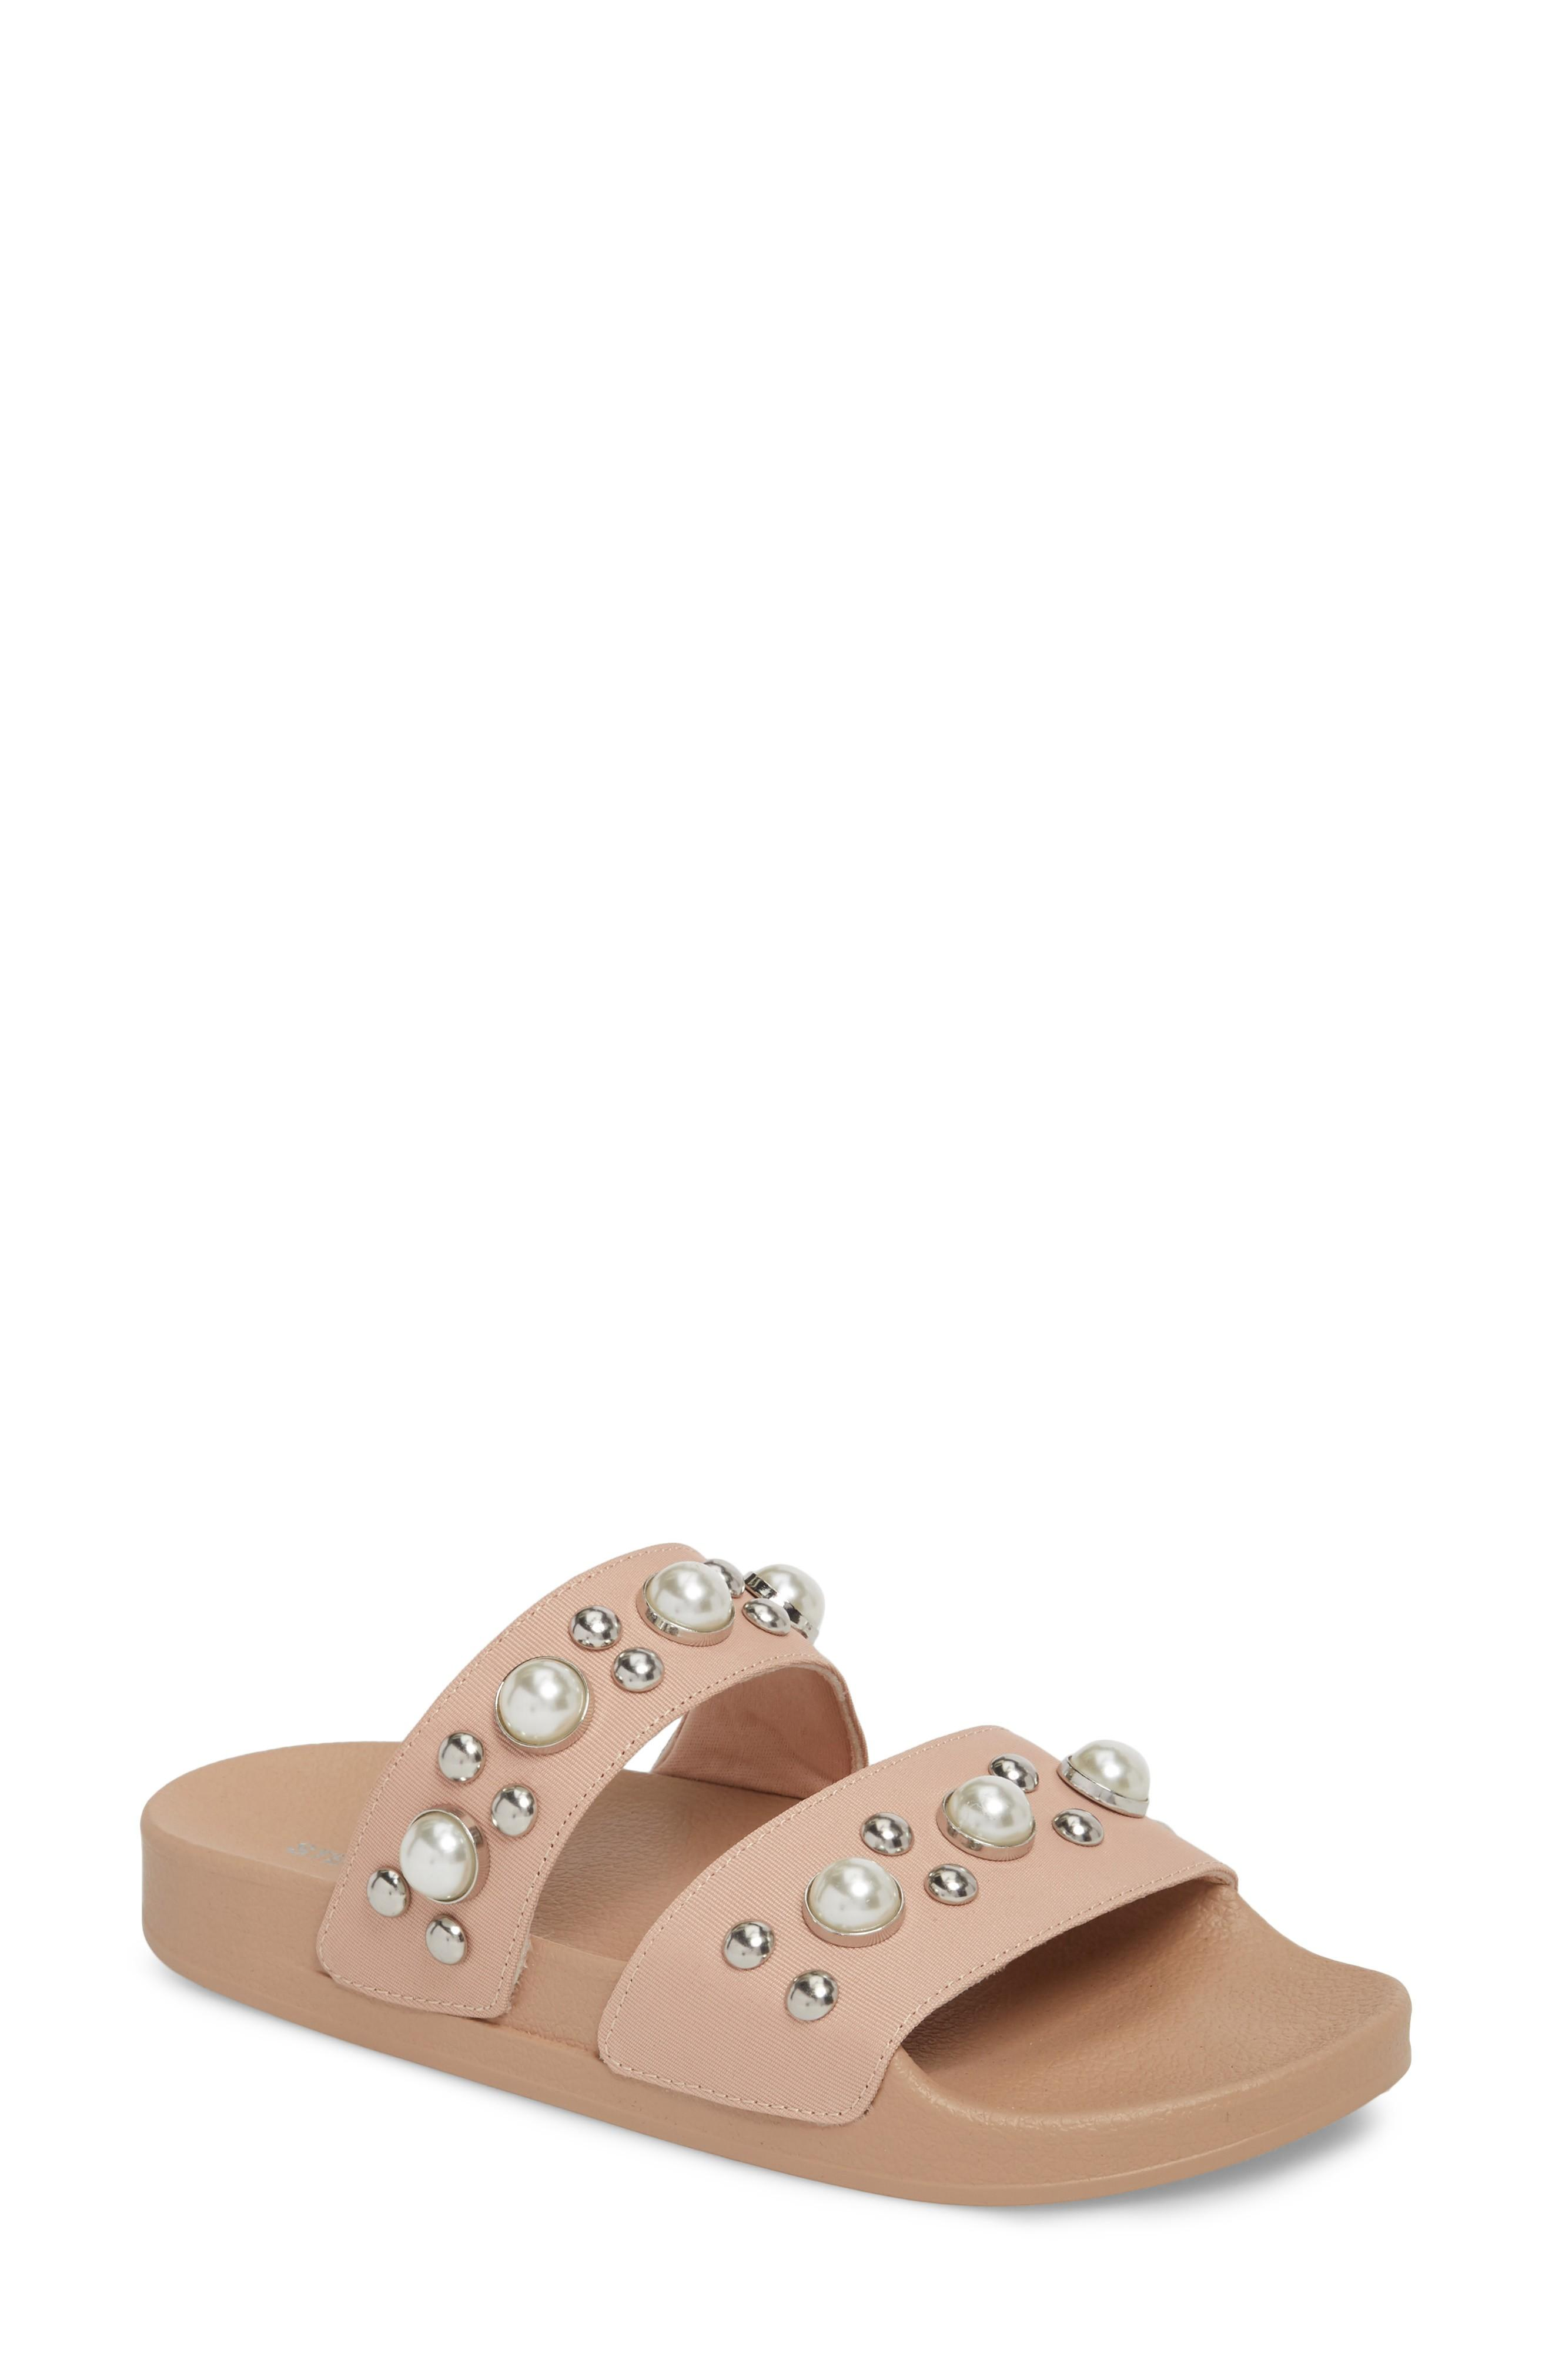 f216eba645c3 Steve Madden Polite Embellished Slide Sandal In Blush